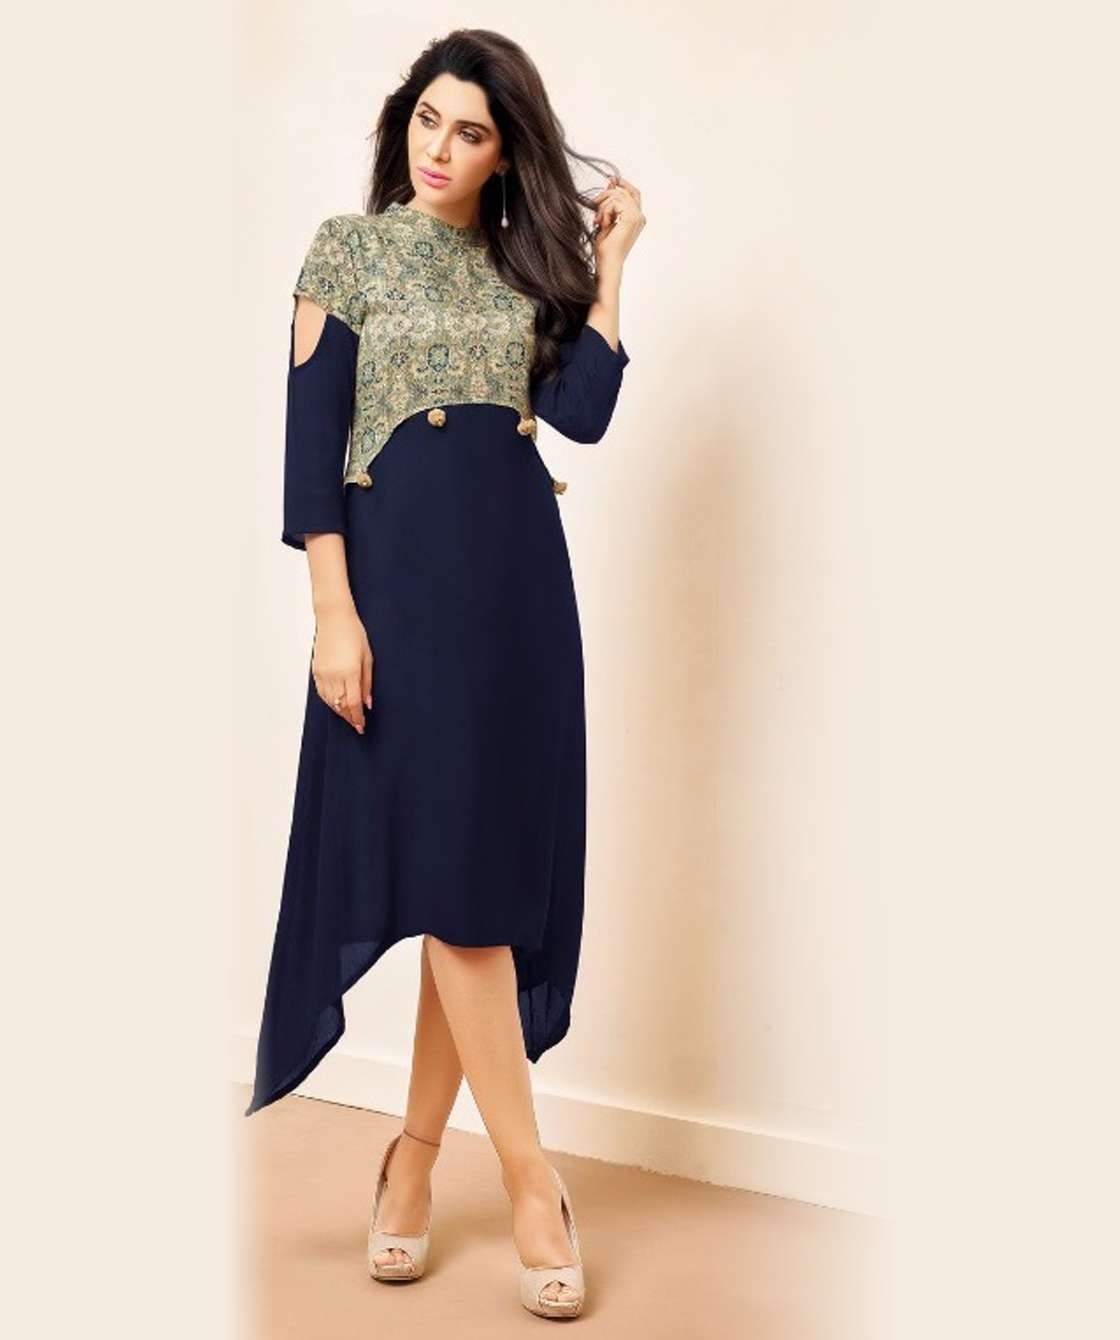 3044eb8a24 Printed Kurtis Wholesale Formal Wear, surat wholesale kurti, surat bulk  supplier, cotton printed kurti design, wholesale supplier from Surat,